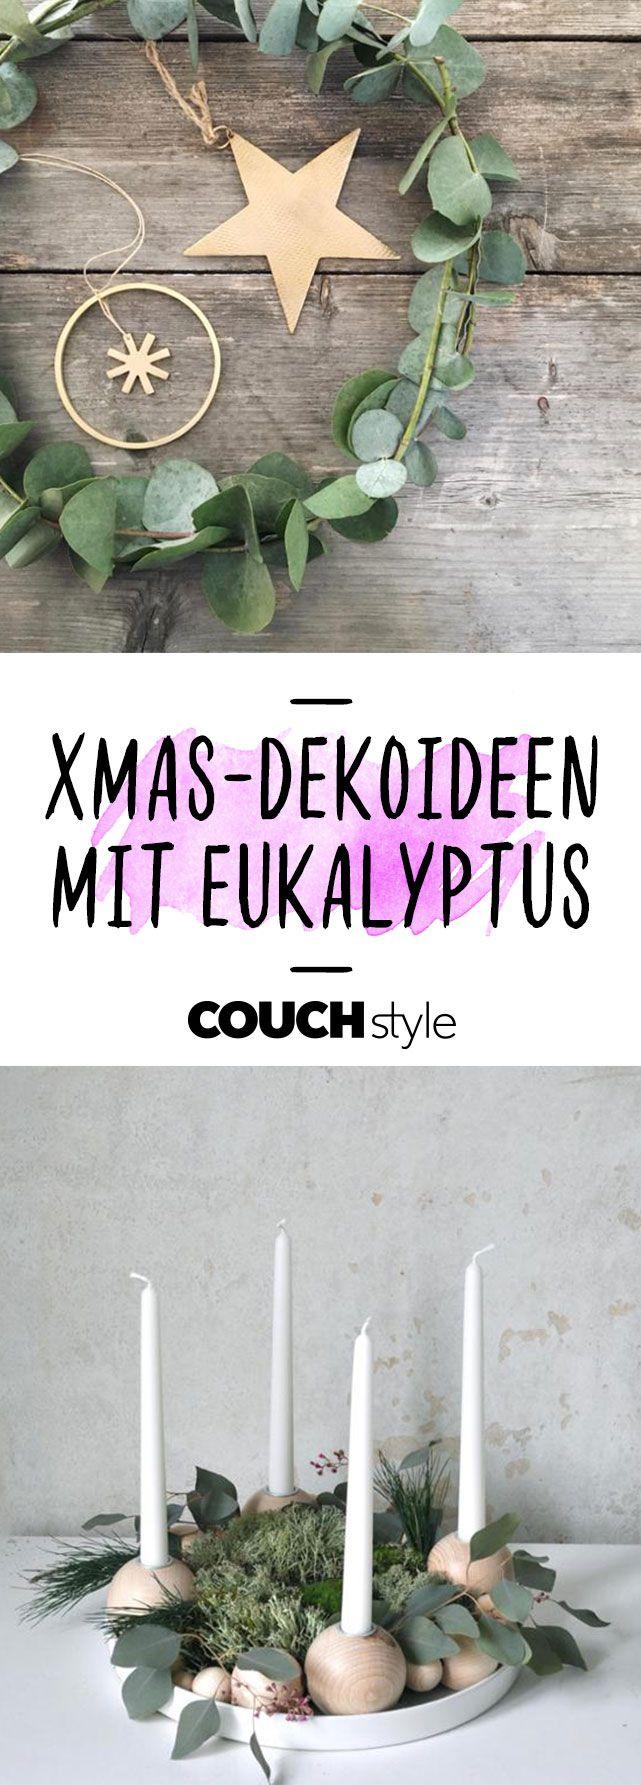 Eukalyptus • Bilder & Ideen